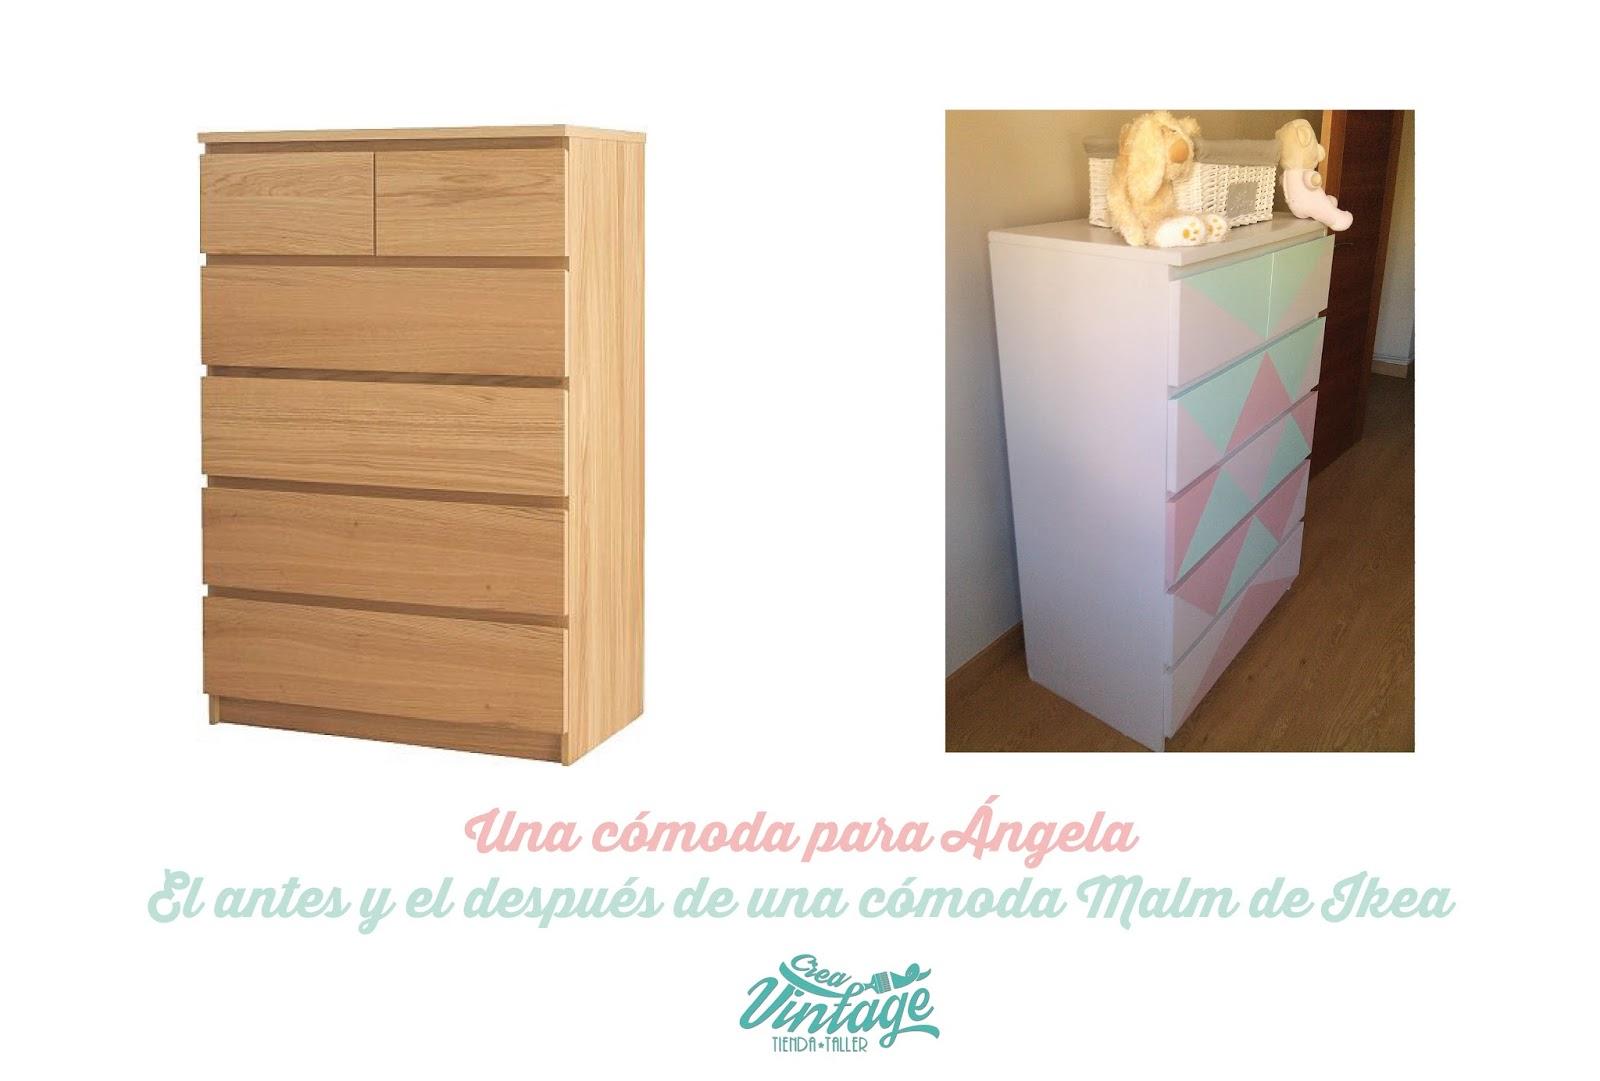 Crea vintage diy 5 pasos para convertir un mueble de for Mueble malm ikea